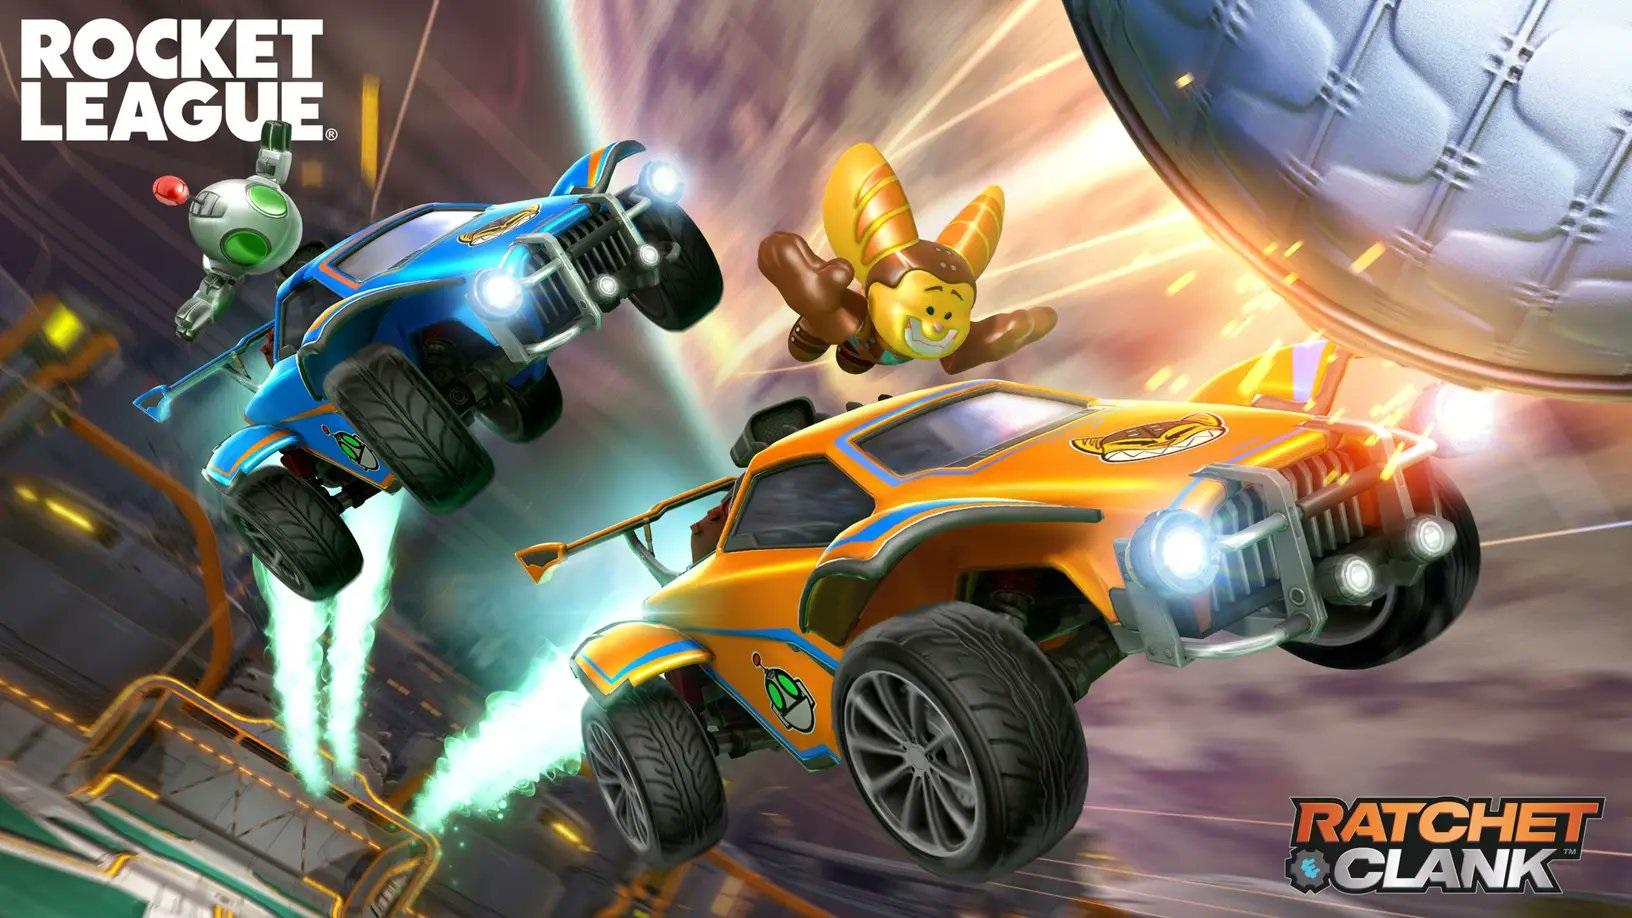 Rocket League: PS5 version is coming + free Ratchet & Clank bundle